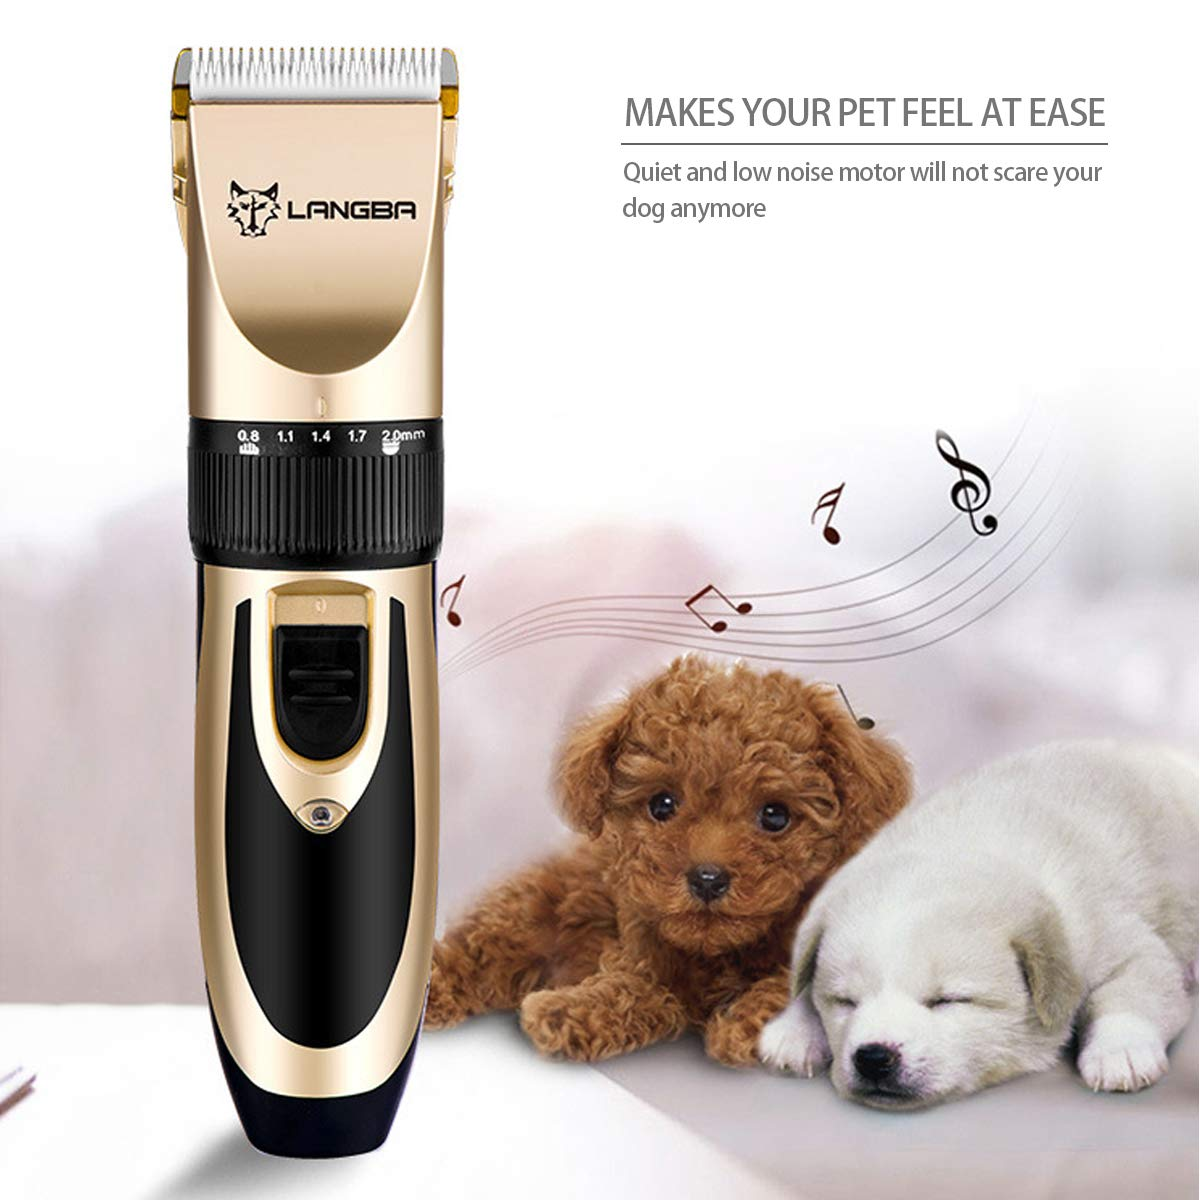 PETCUTE Cortapelos para Perros Cortar Pelo Recortadora de Pelo inalámbrico Recargable máquina de Afeitar del Pelo del Gato maquinillas de Perro 4 guías de ...